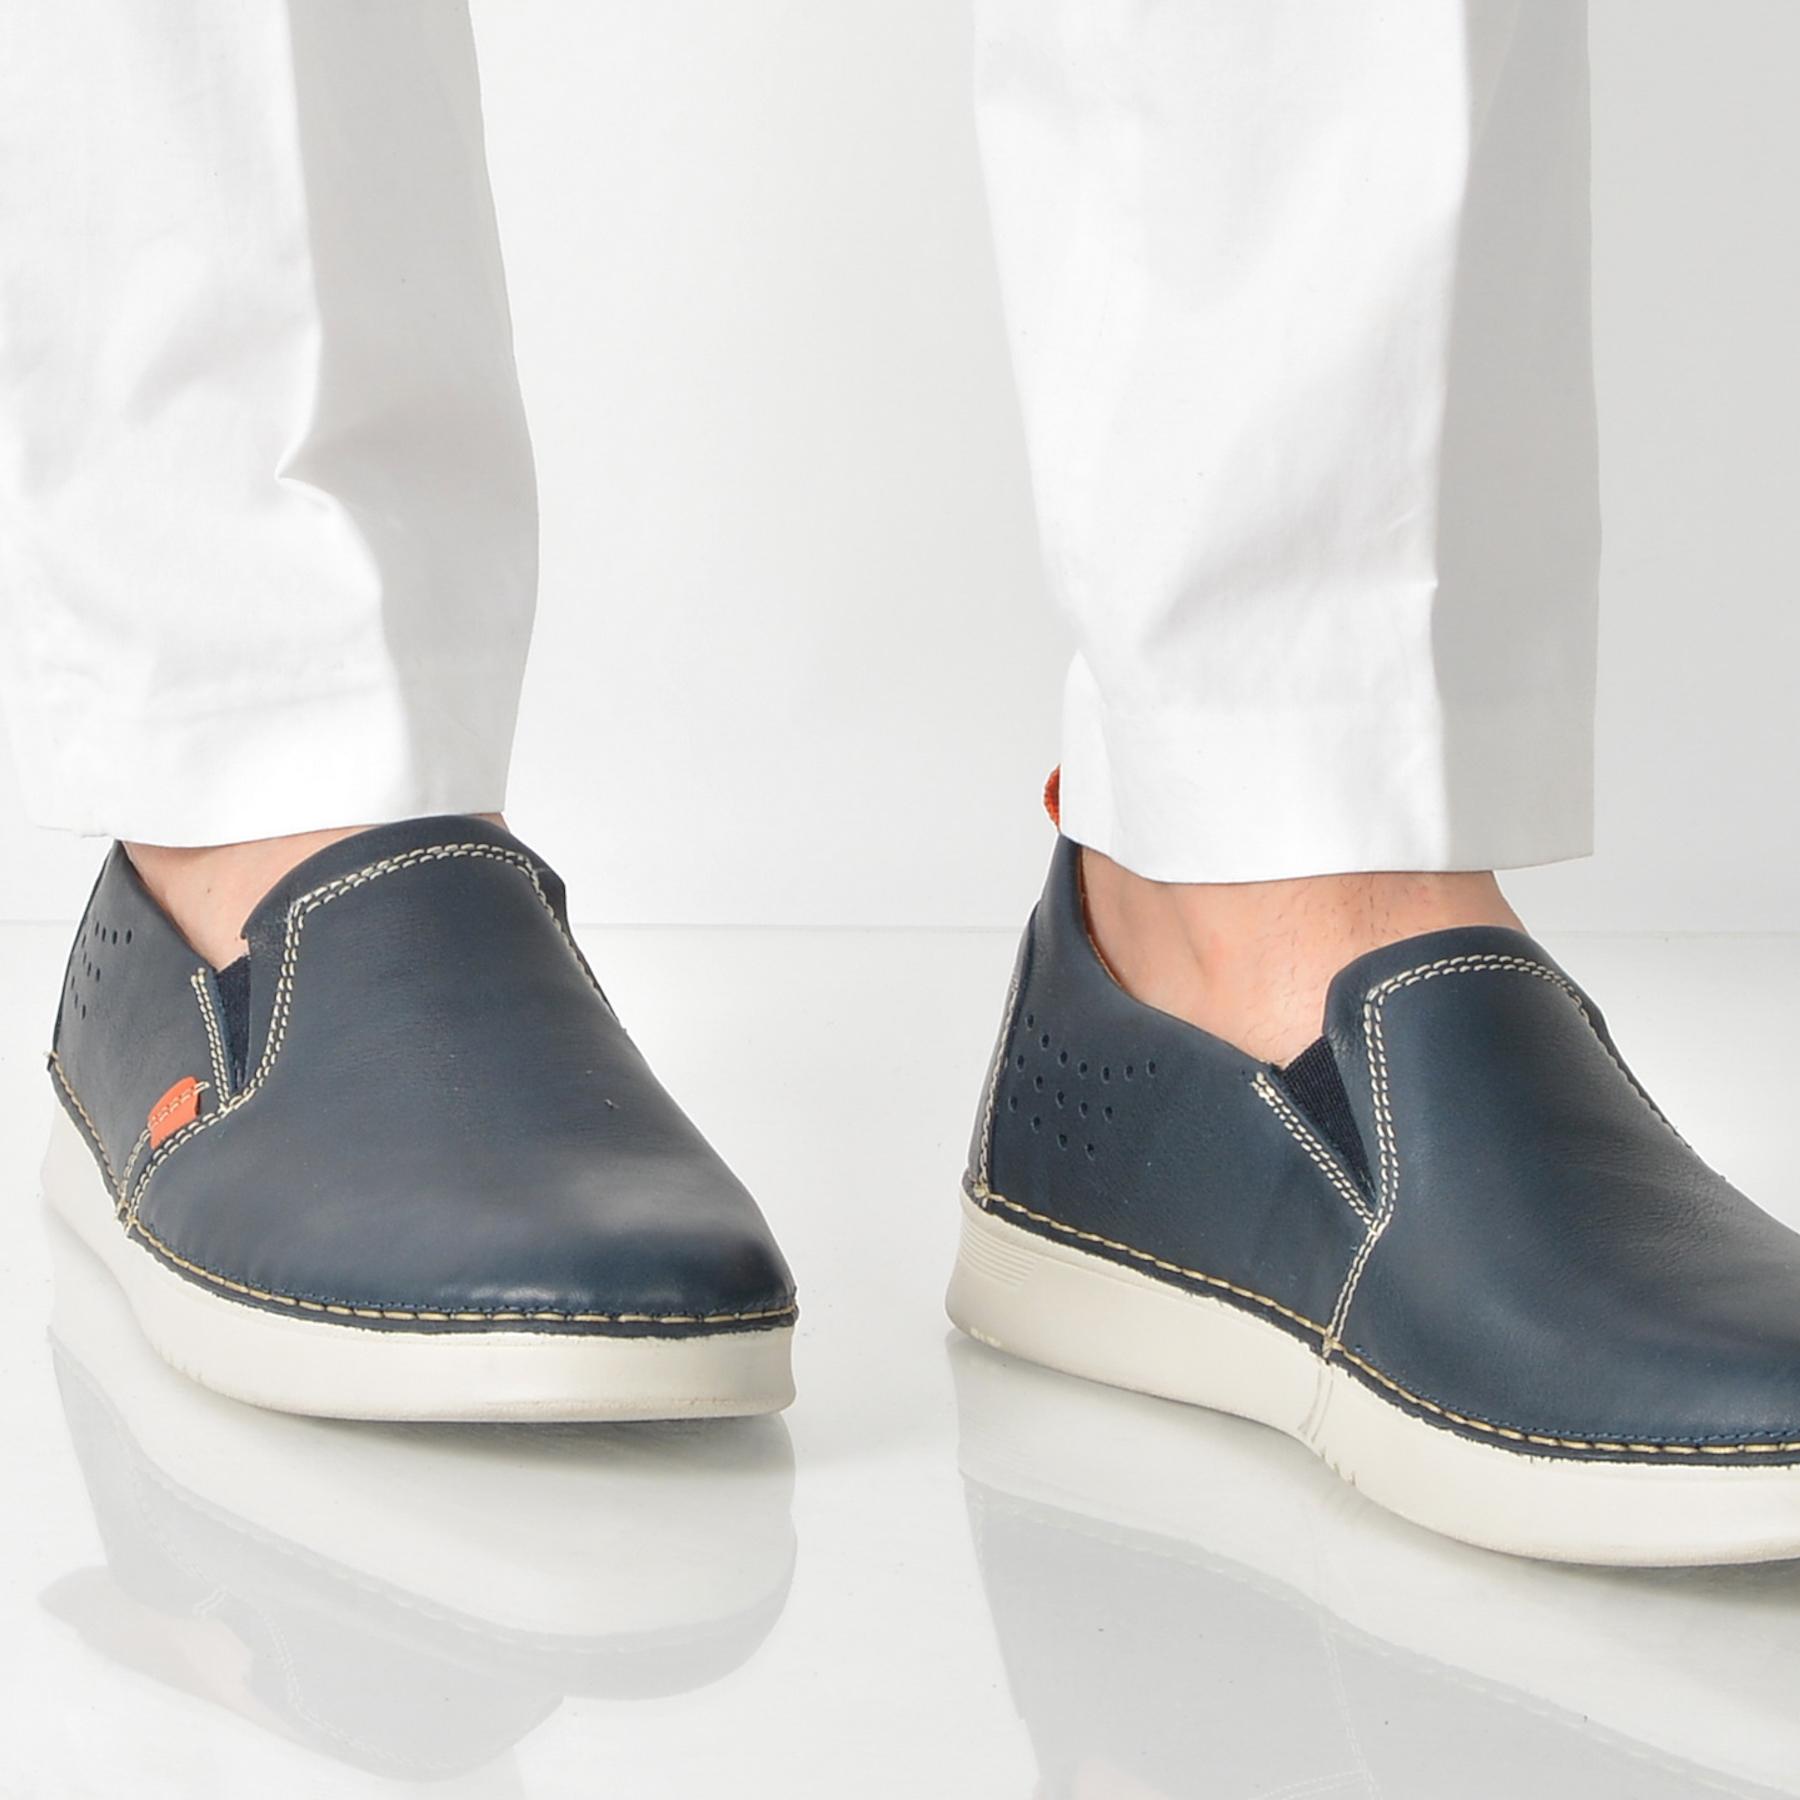 Pantofi Otter Bleumarin, 7453, Din Piele Naturala